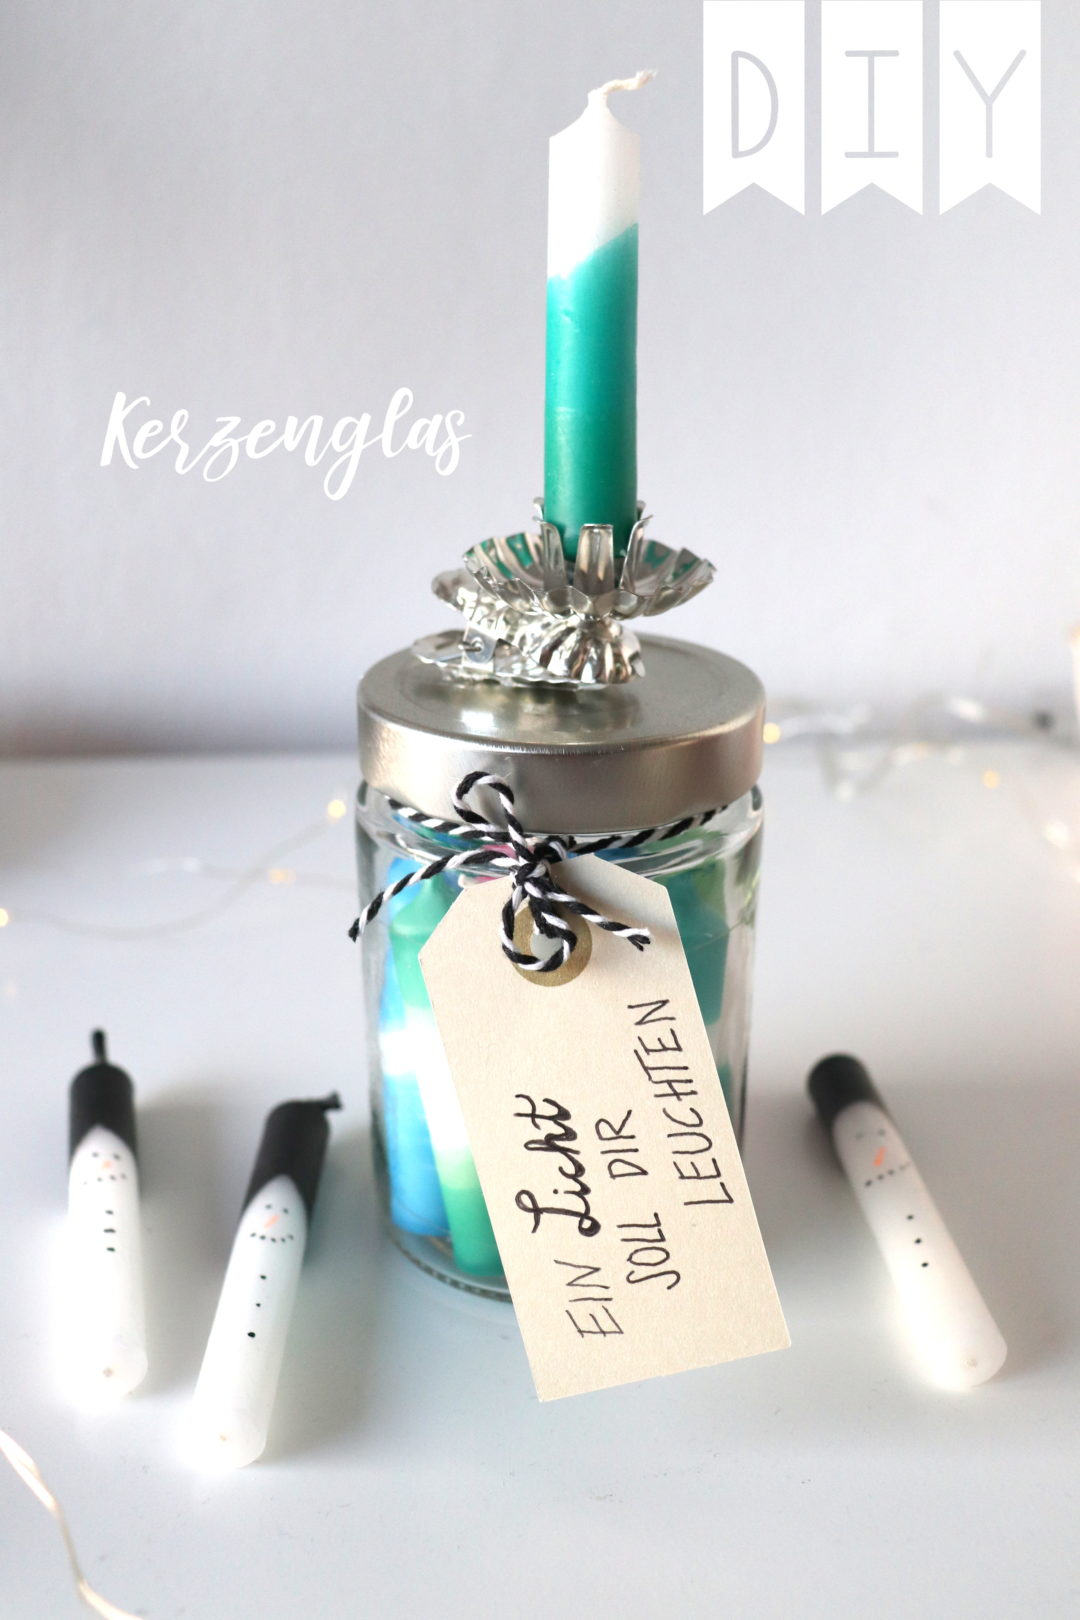 DIY Kerzenglas